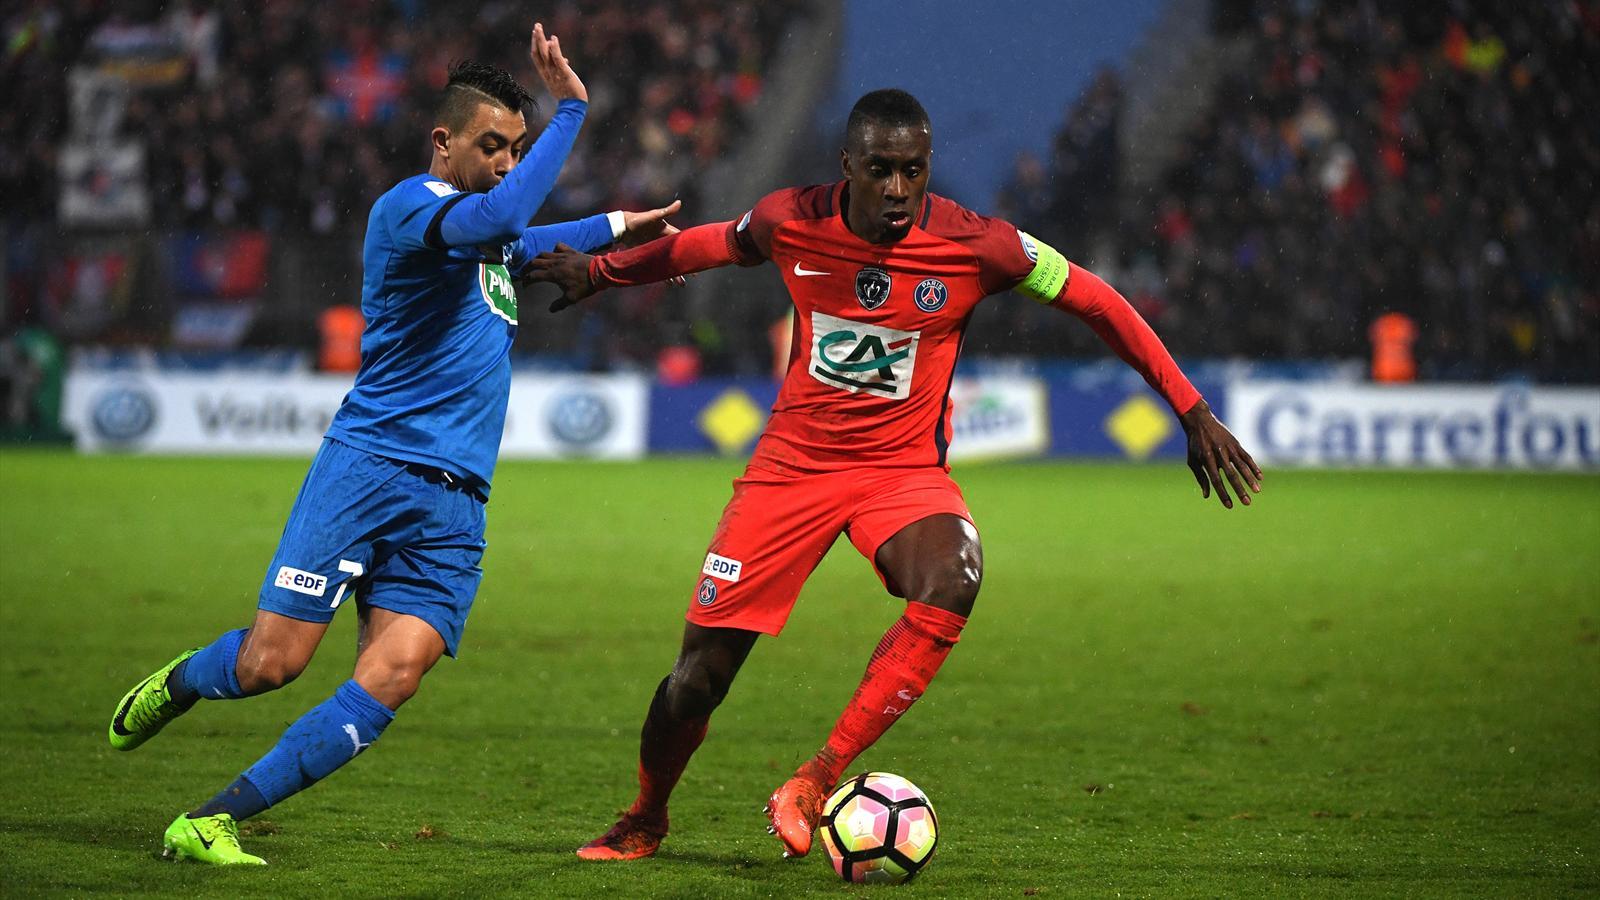 Coupe de france avranches psg et angers bordeaux en quarts de finale coupe de france 2016 - Coupe de france football calendrier ...